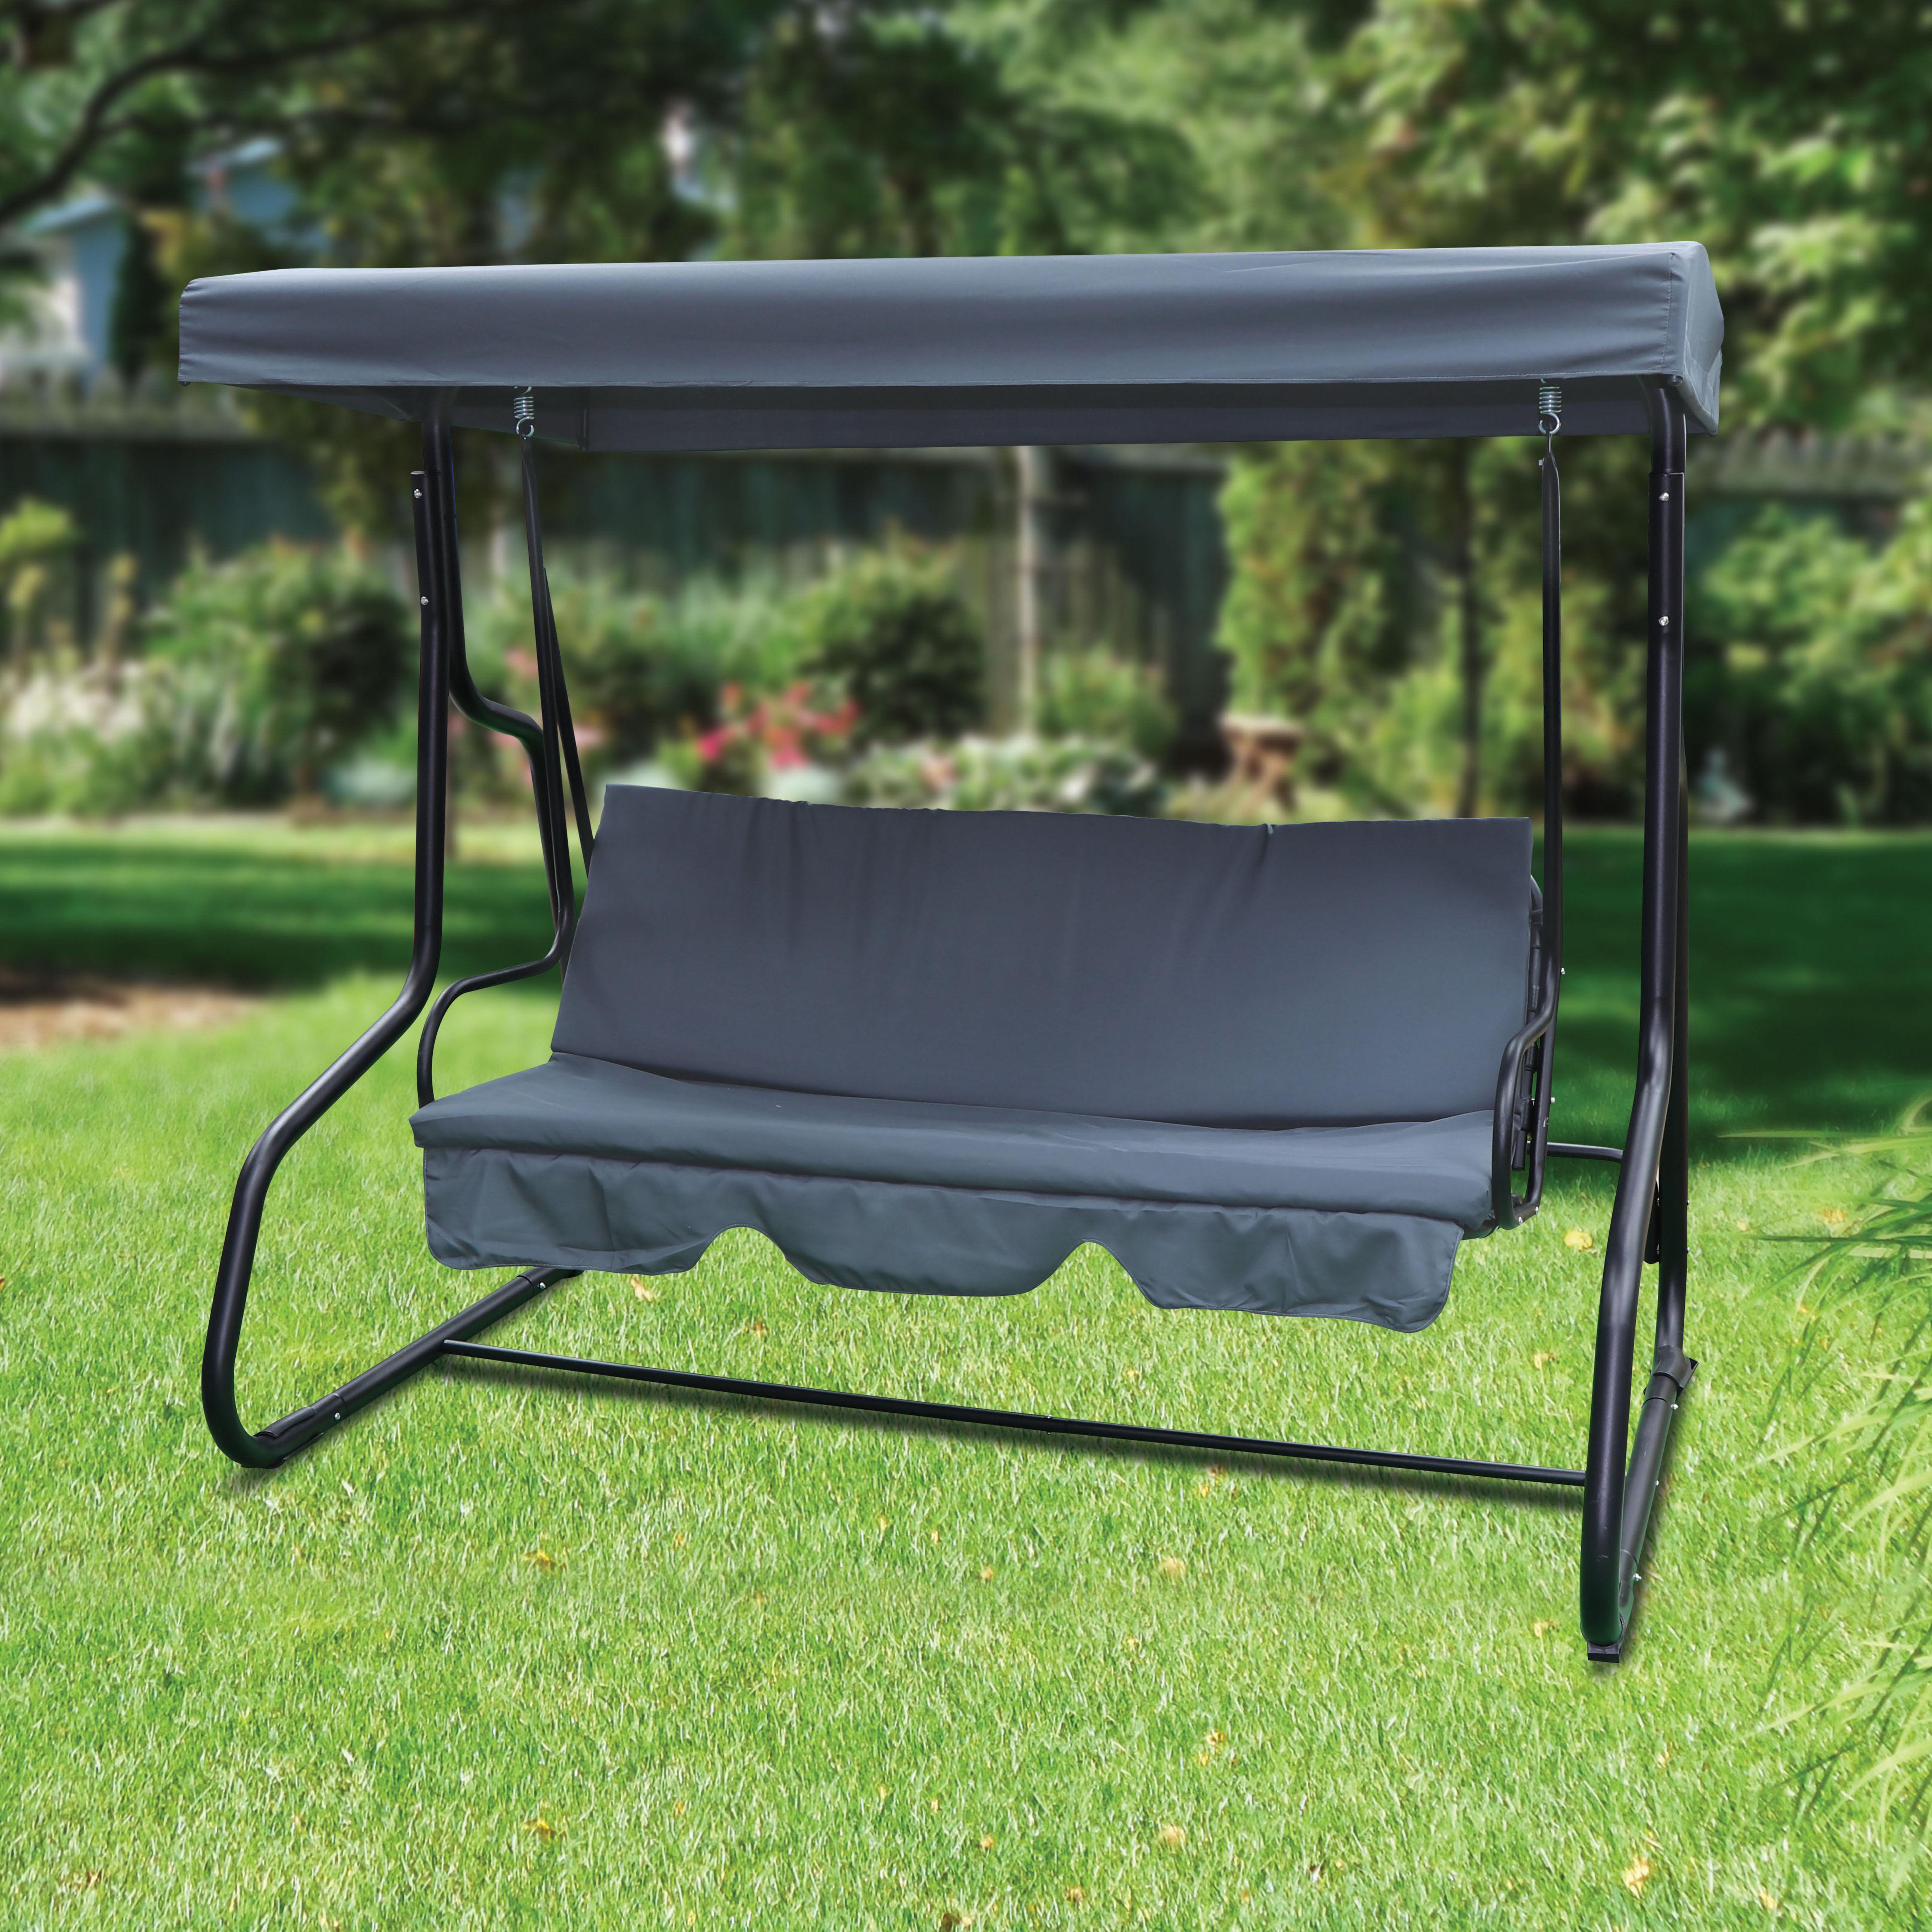 3 Seater Luxury Garden Swing Chair